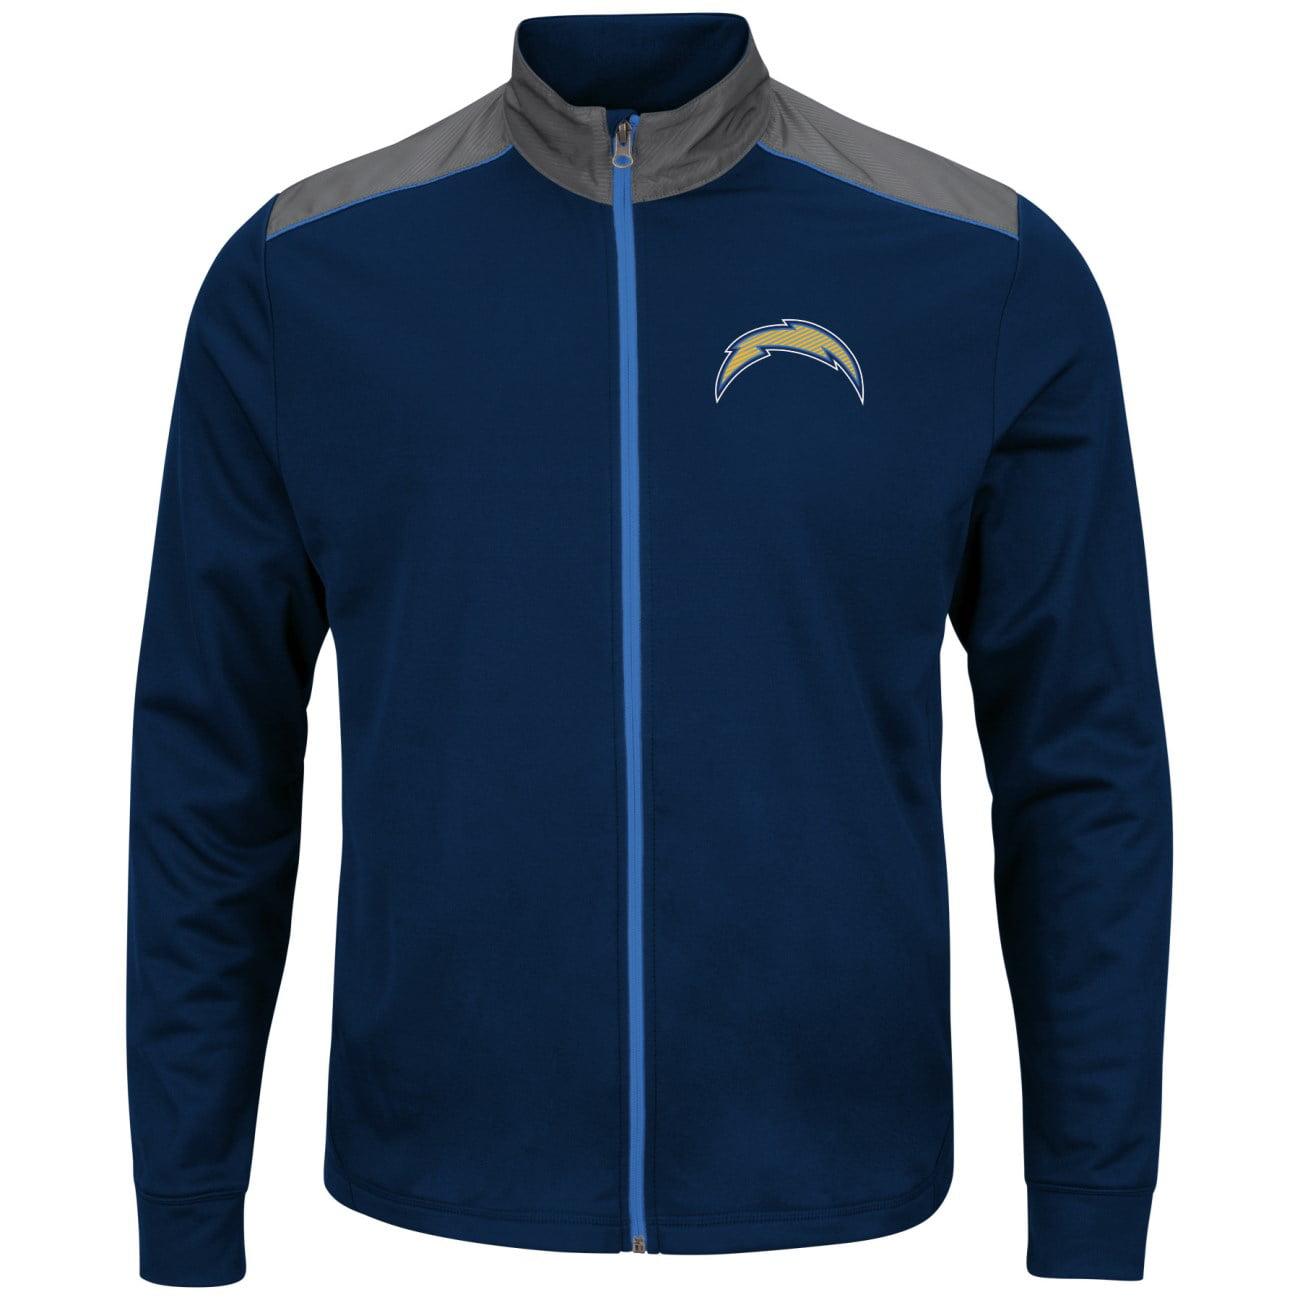 "San Diego Chargers Majestic NFL ""Team Tech"" Men's Full Zip Jacket Sweatshirt by Majestic"